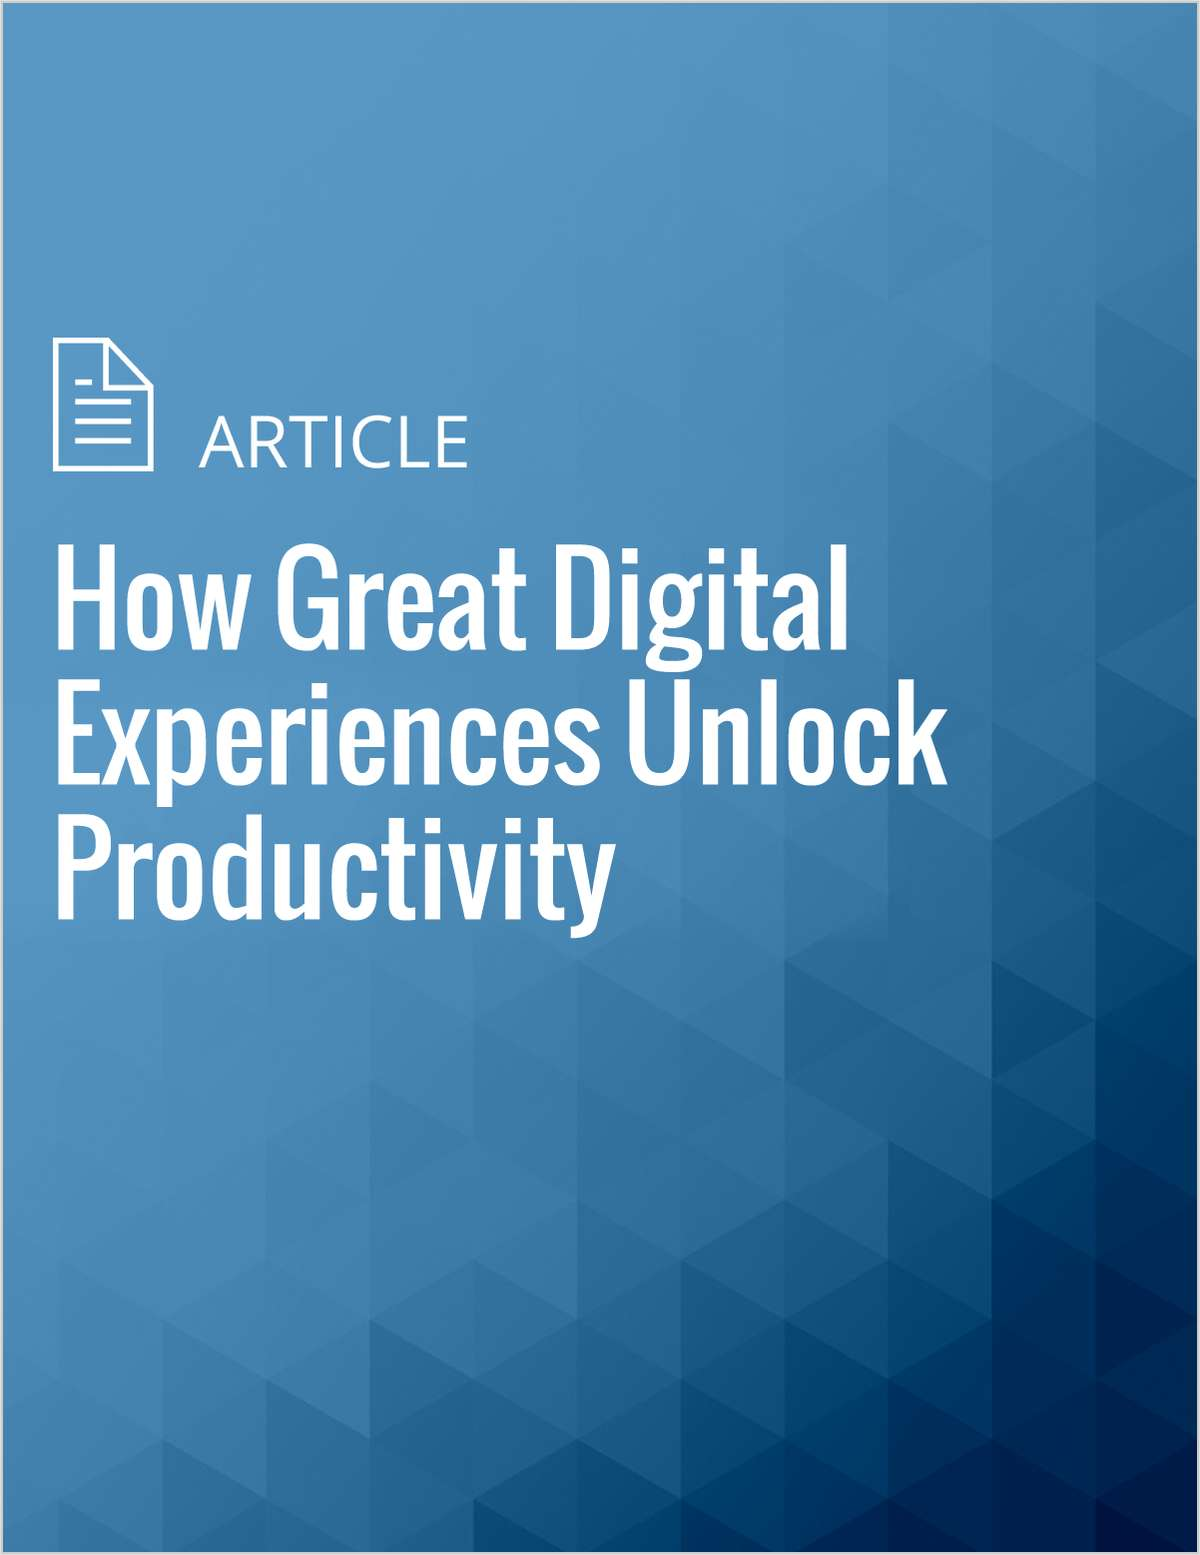 How Great Digital Experiences Unlock Productivity